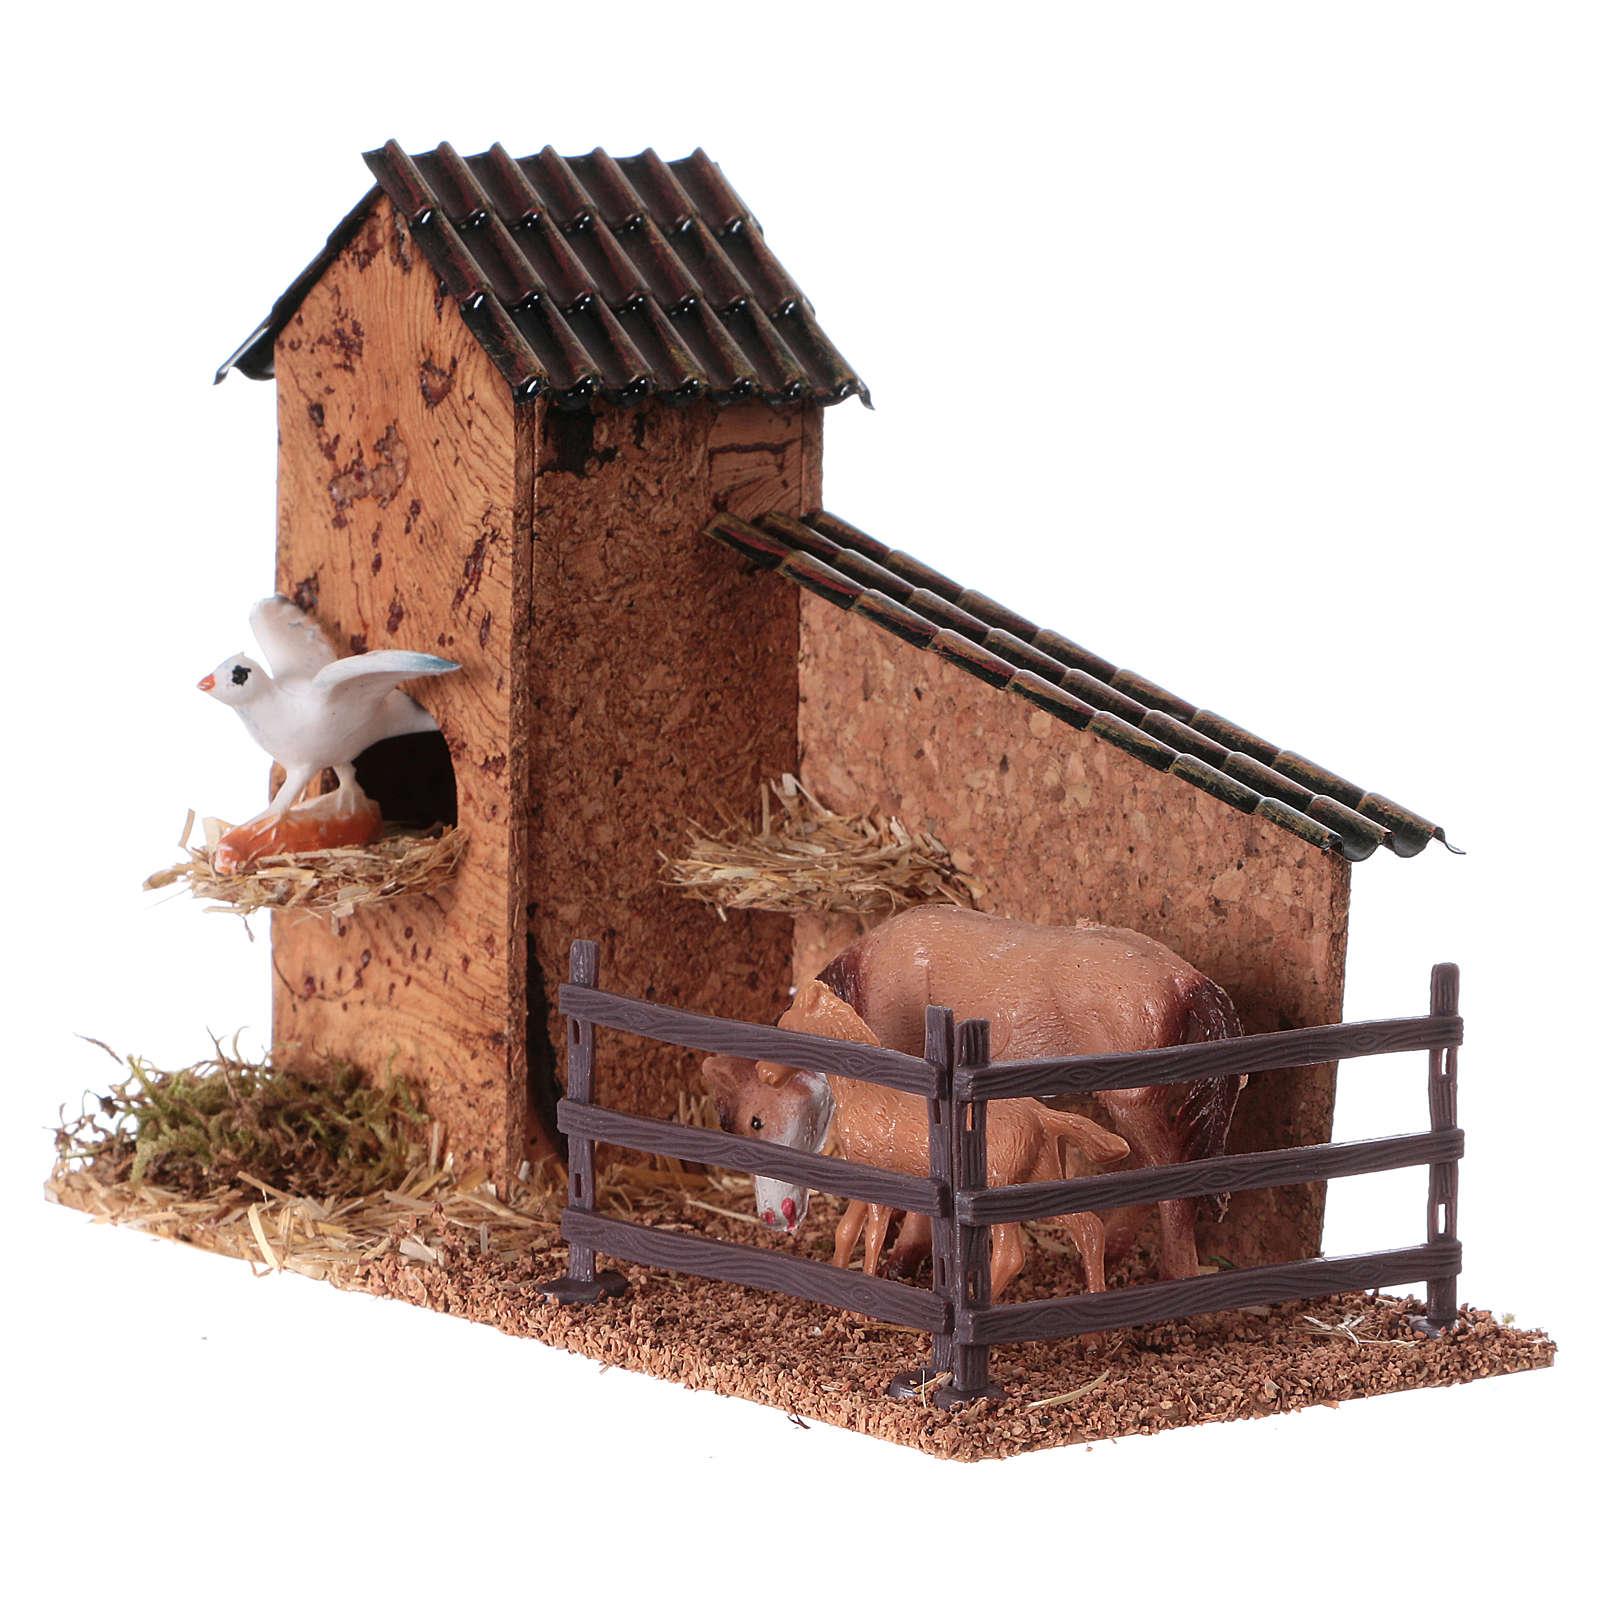 Horse enclosure and dovecote for Nativity scenes of 9 cm 3